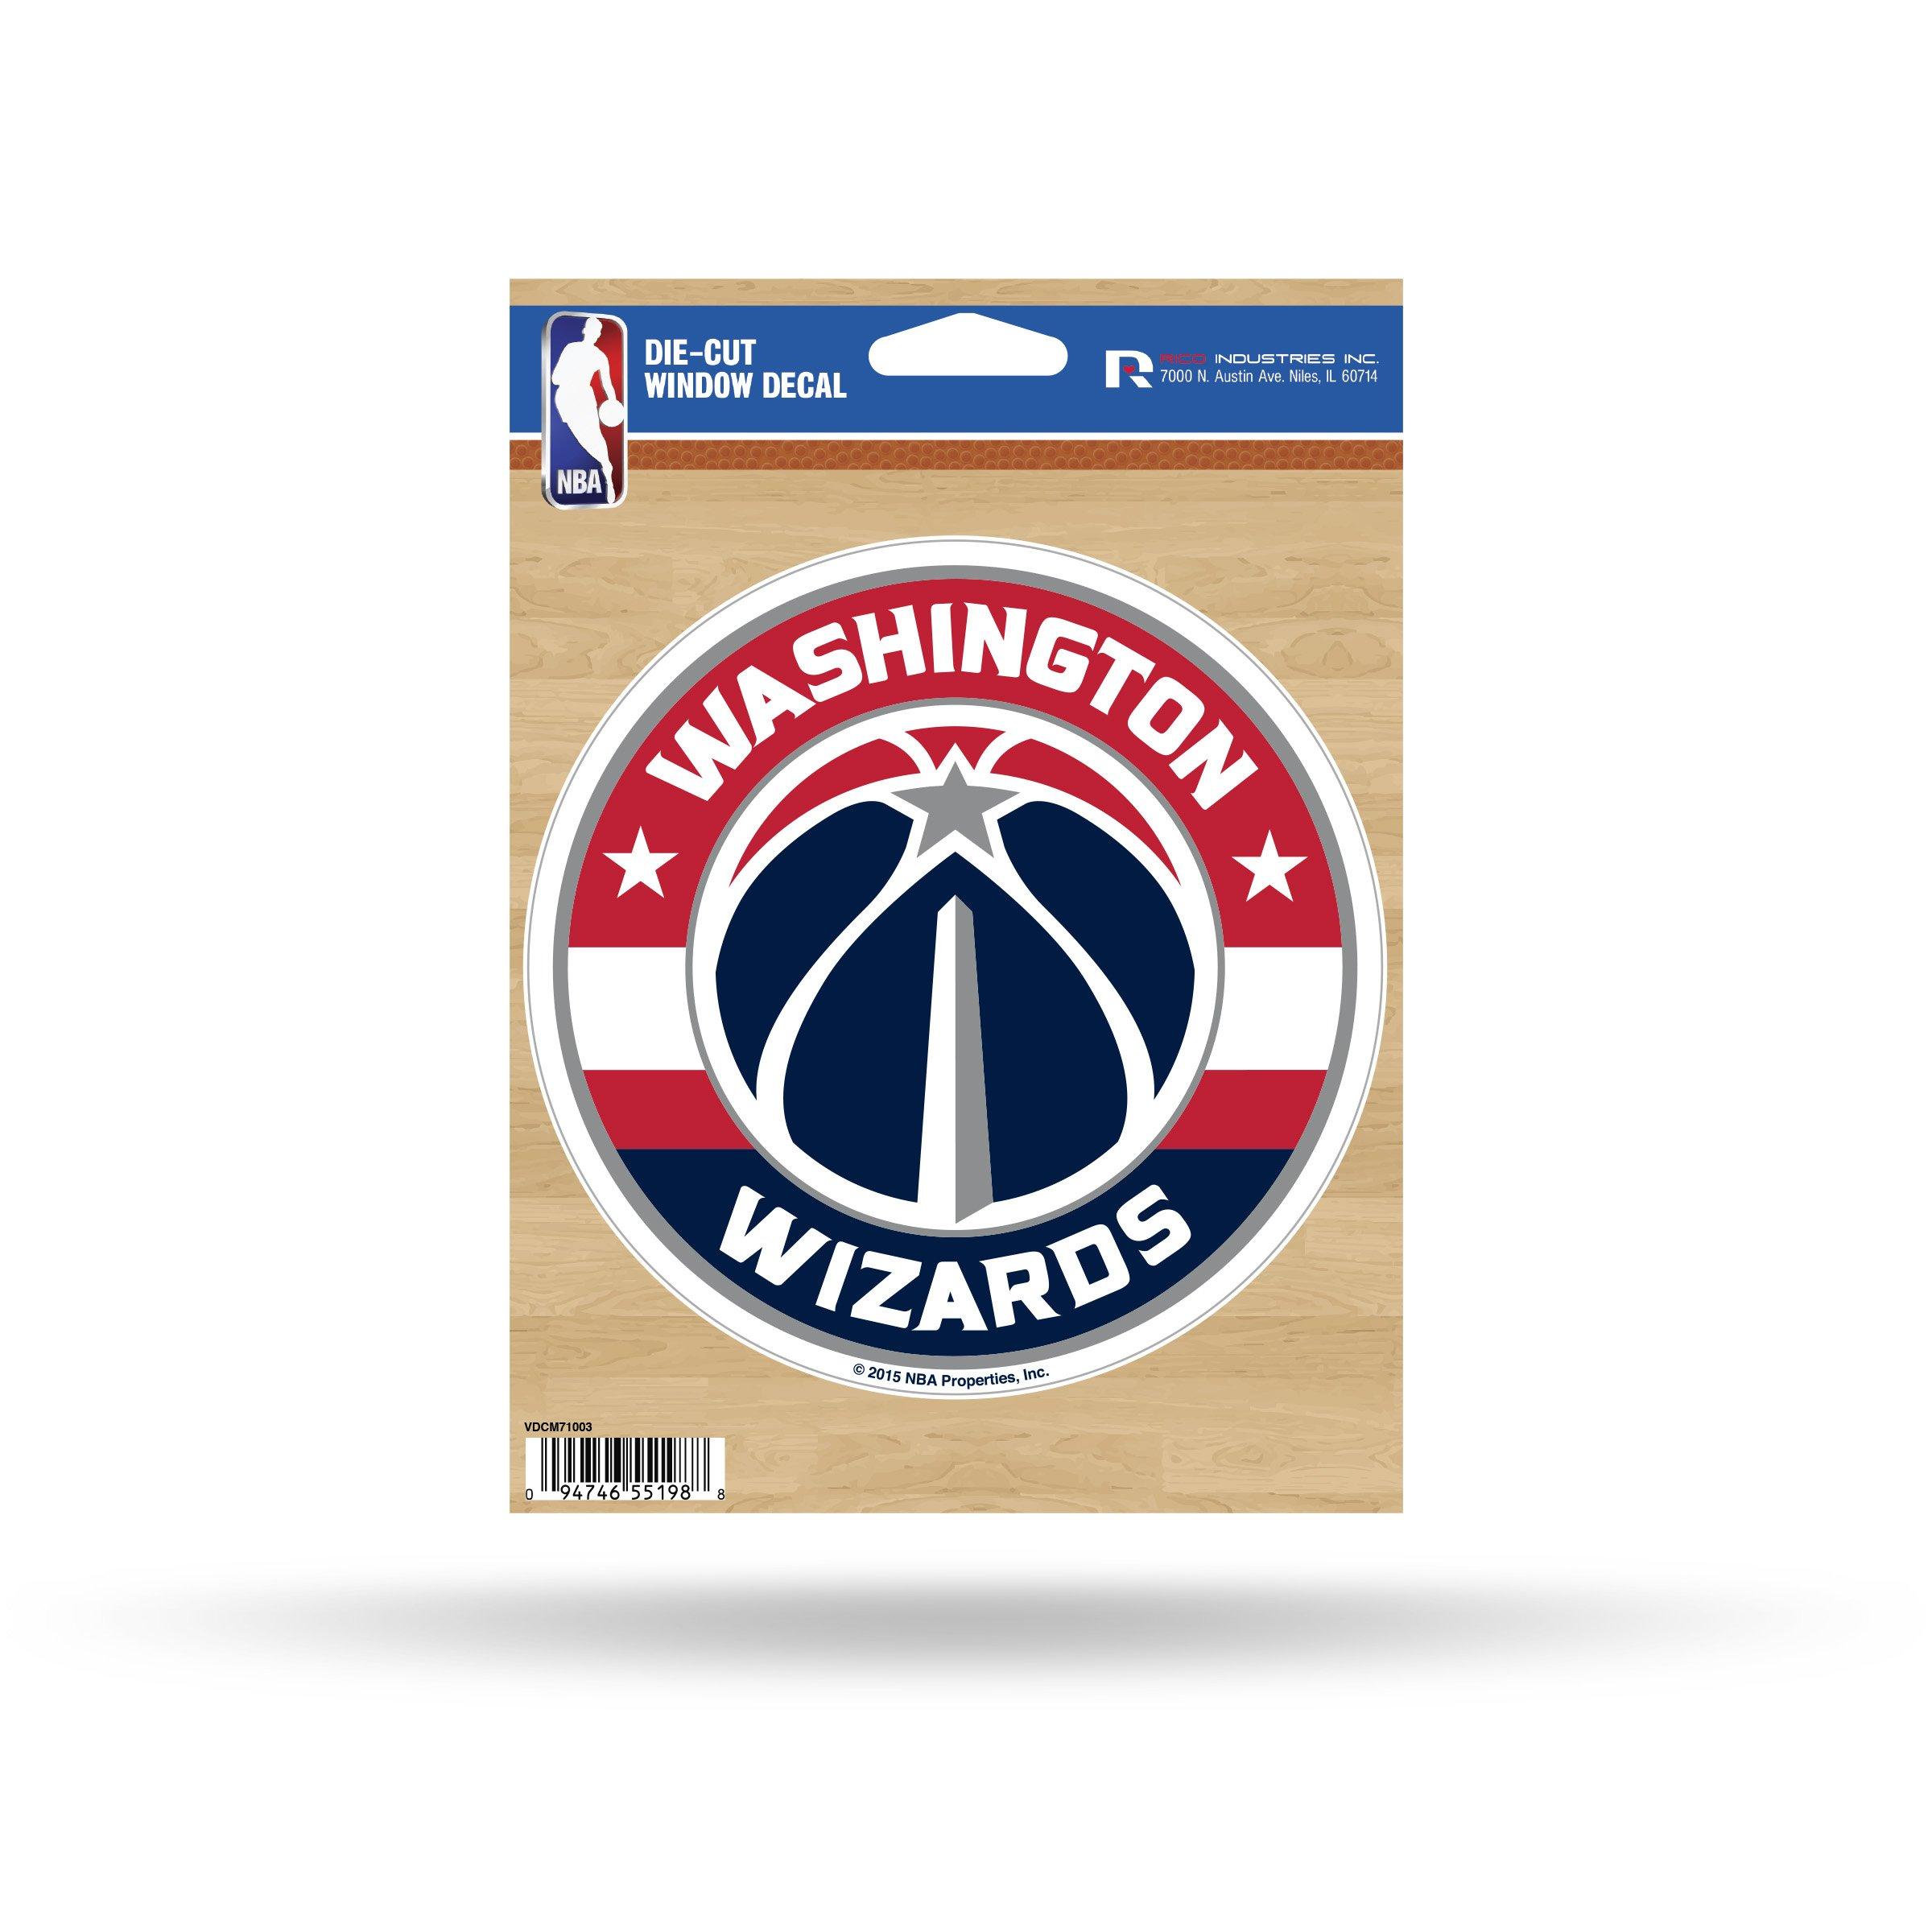 Rico NBA Washington Wizards Die Cut Vinyl Decal